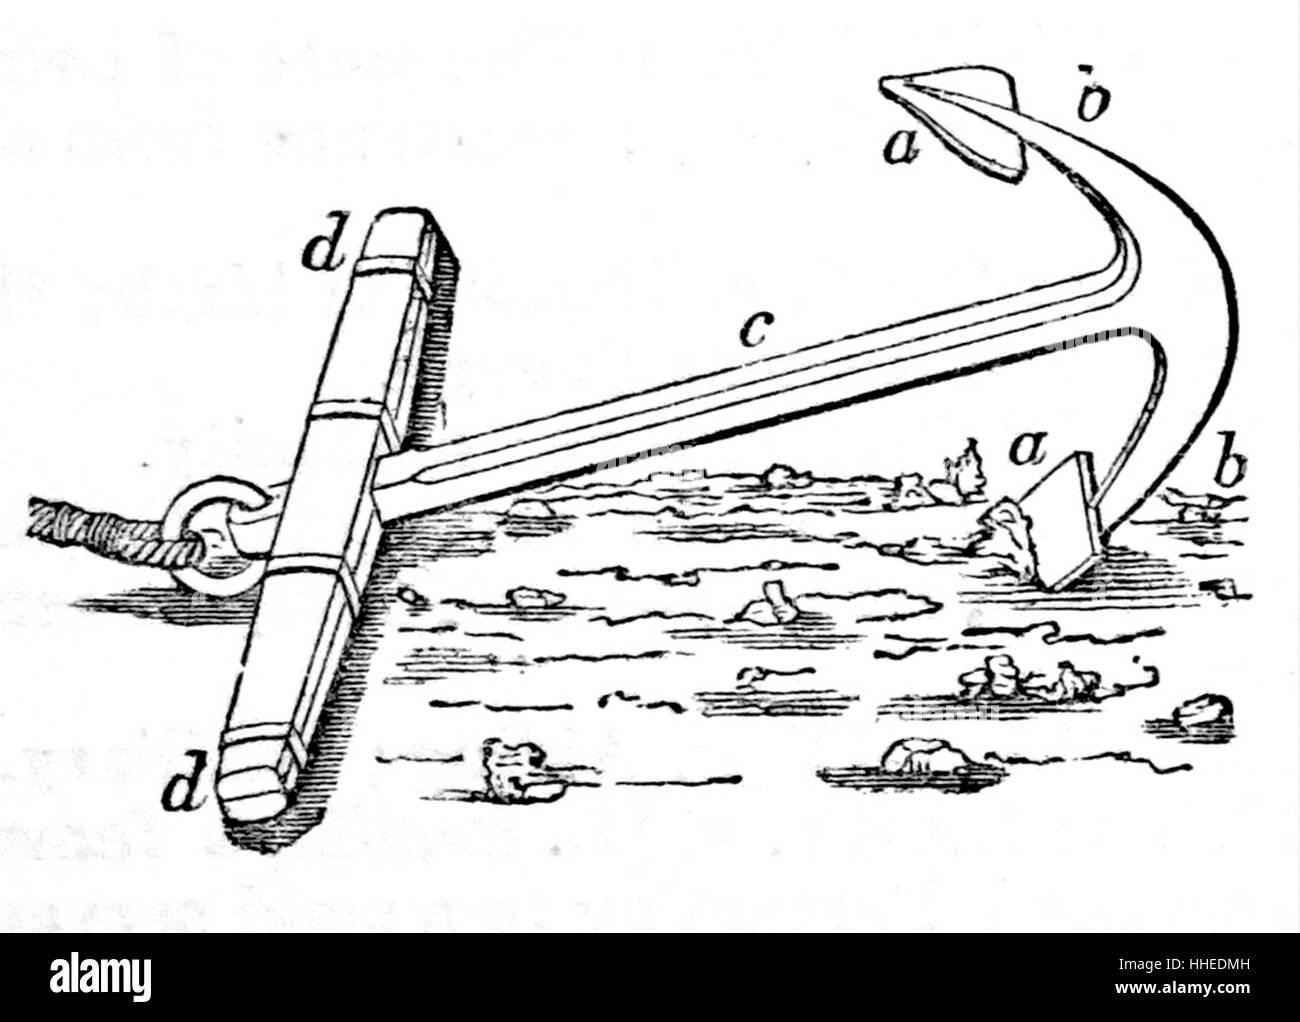 Engraving of an anchor - Stock Image